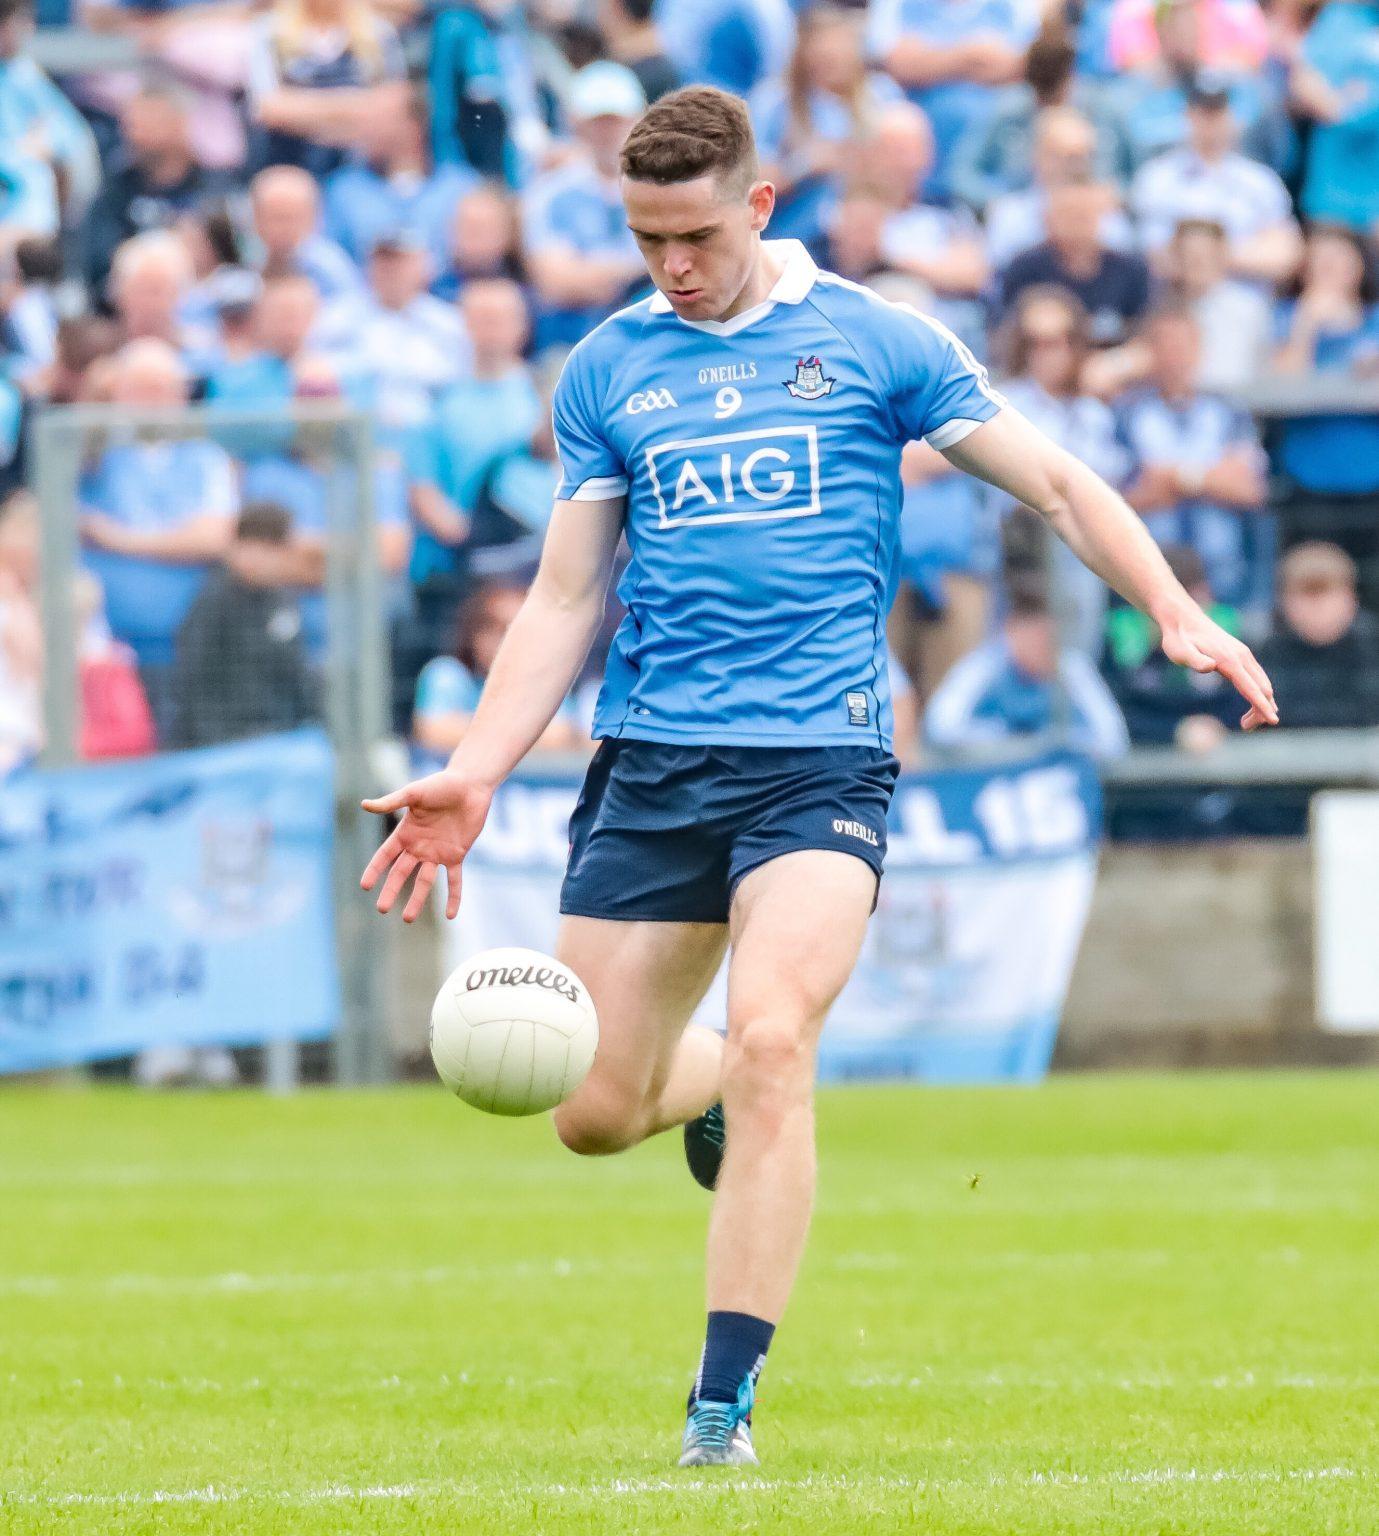 Dublin footballer Brian Fenton In A Sky Blue Jersey Kicking A White Ball Put In man of the match performance as Dublin demolish Longford